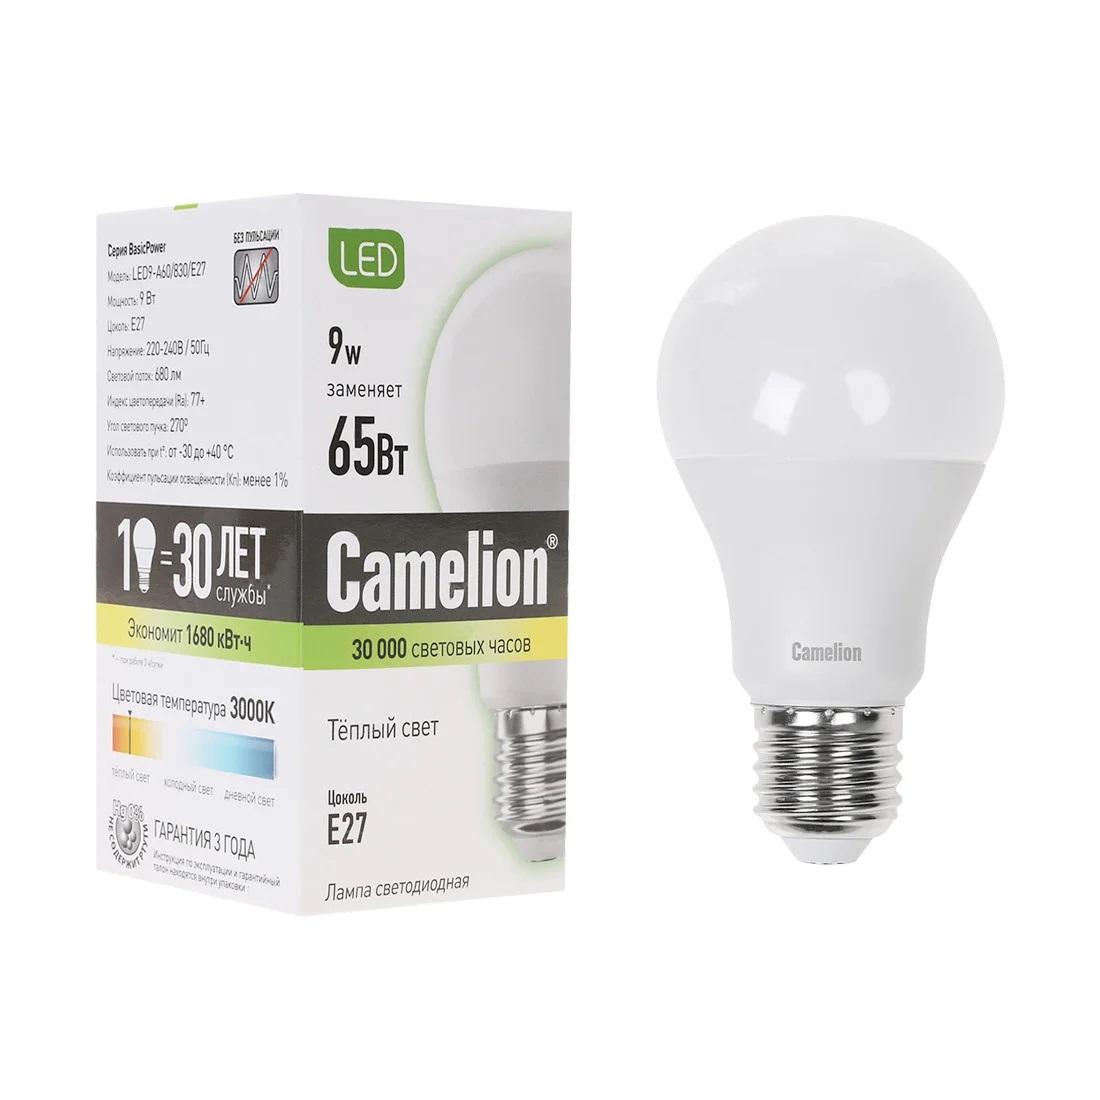 Лампочка Camelion А60/4500К/E27/11Вт, Холодный